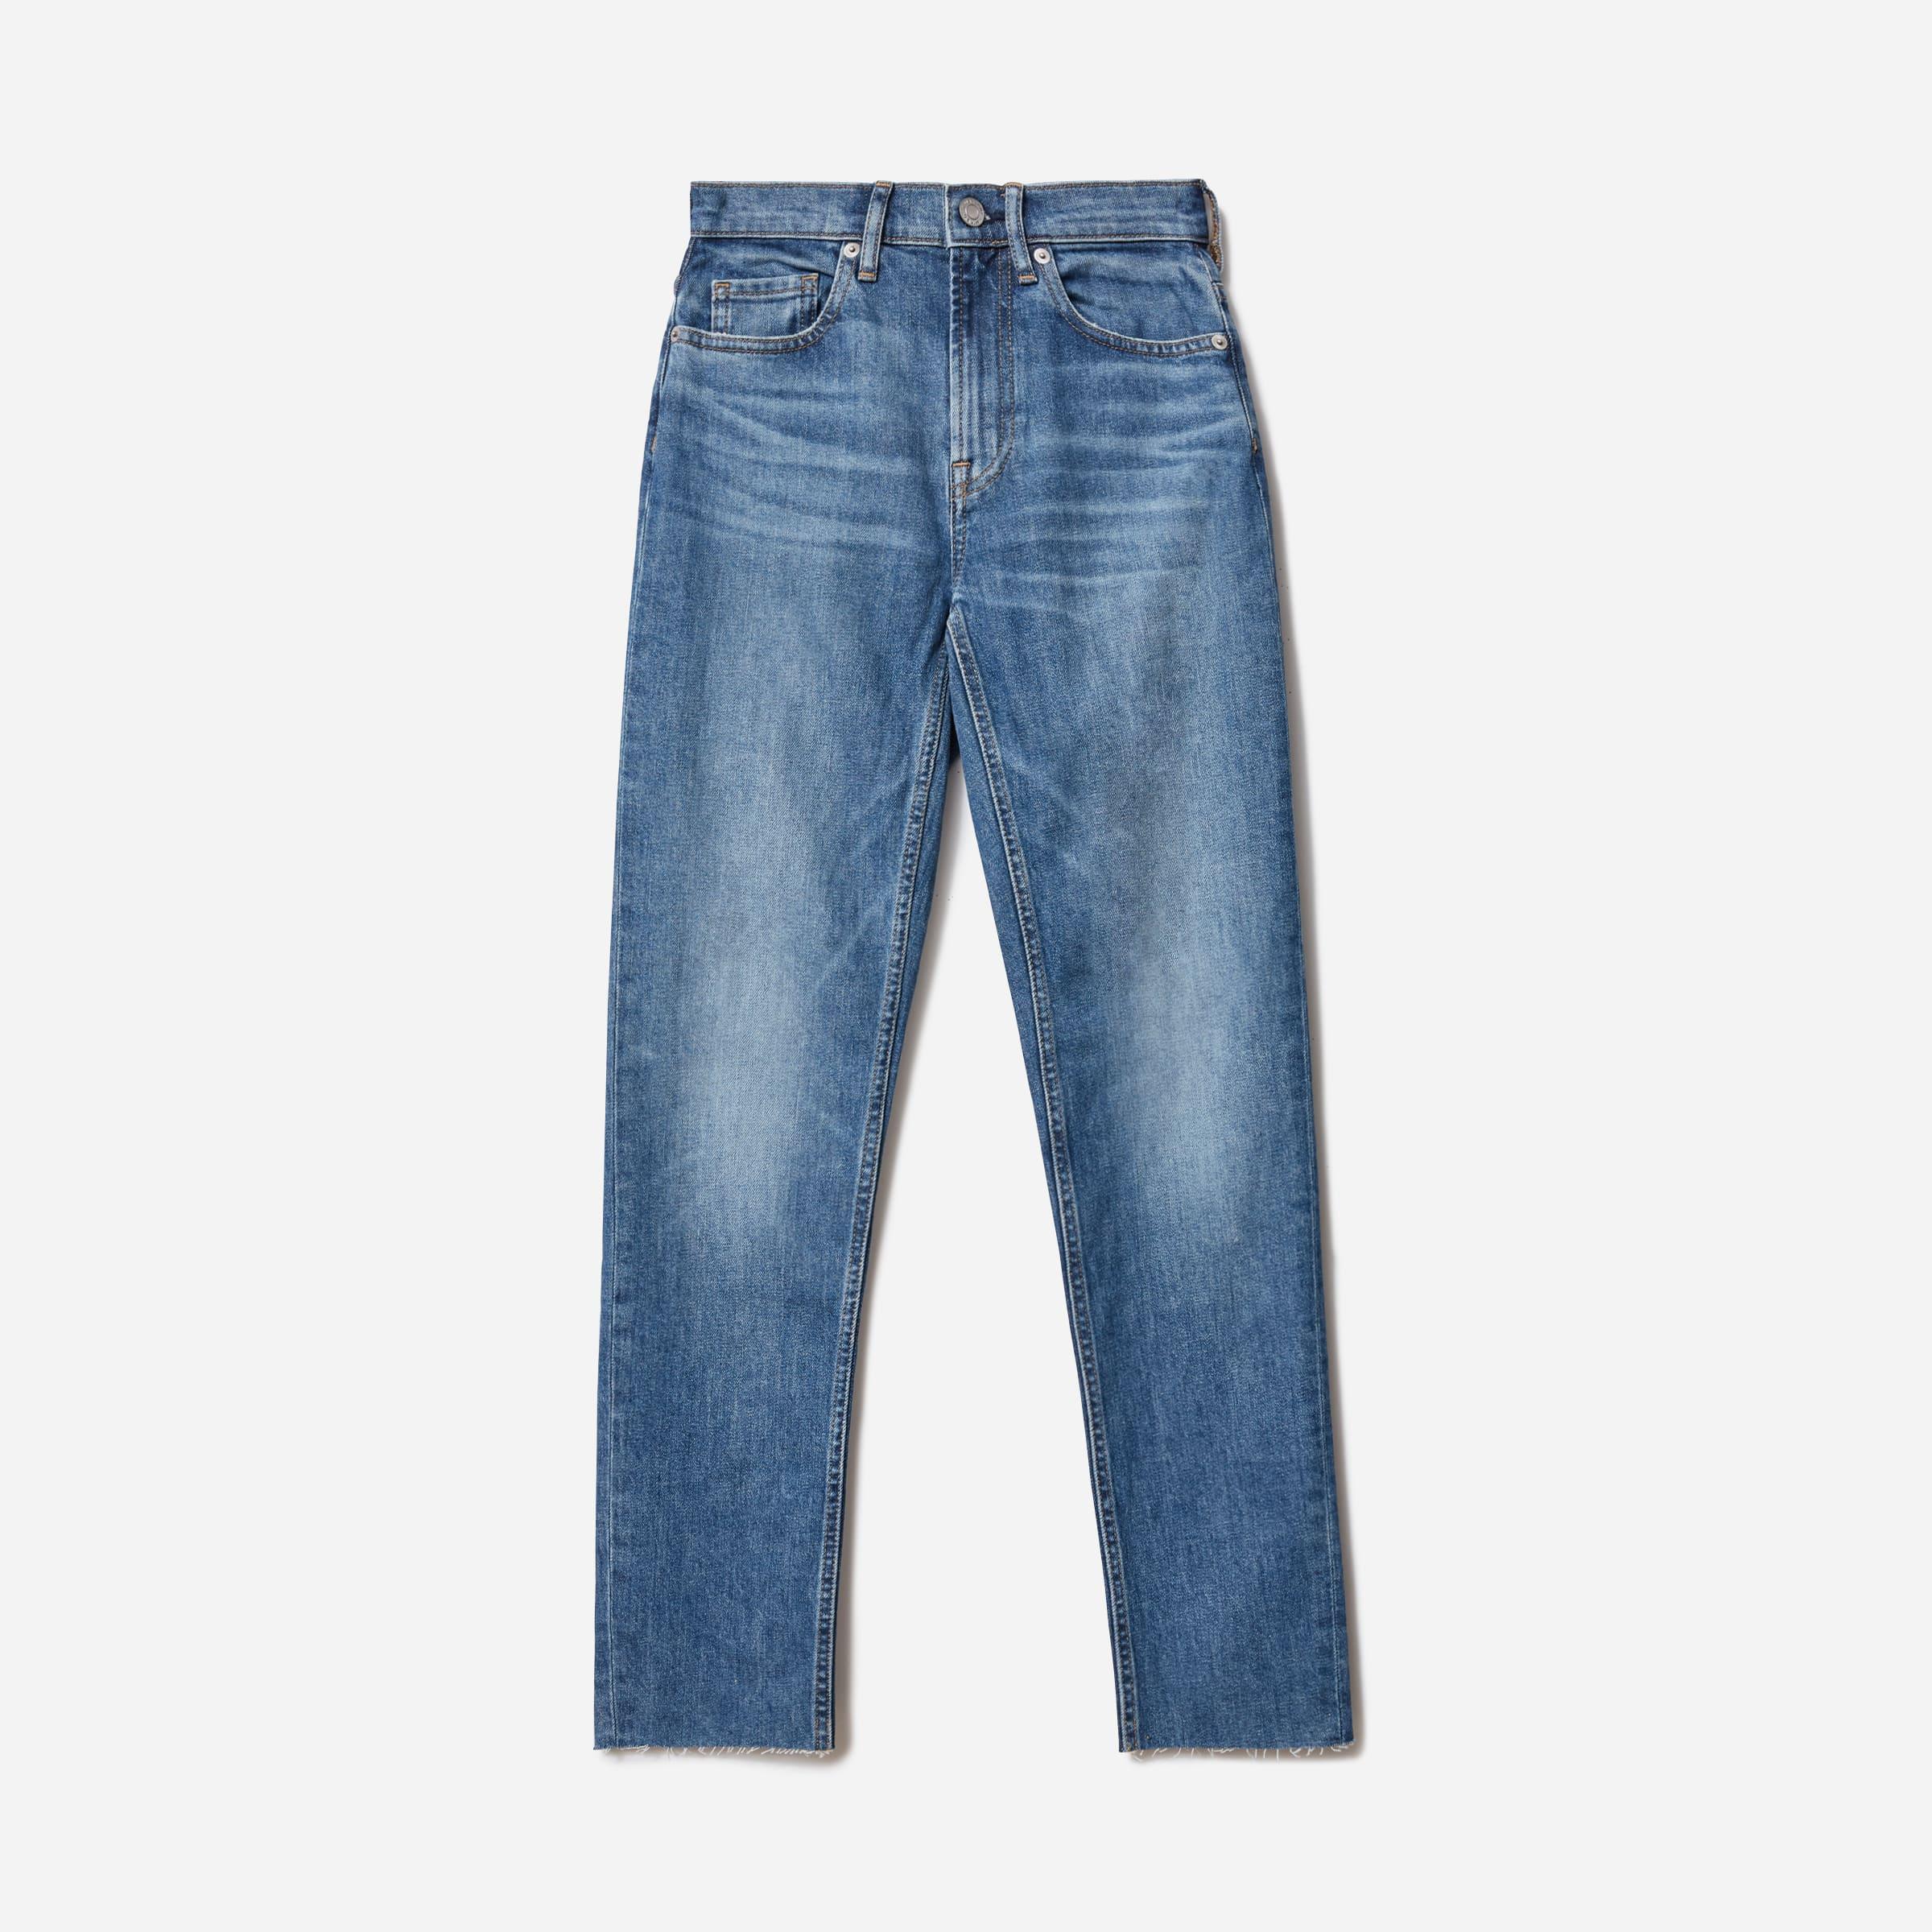 The Original Cheeky Jean | Everlane